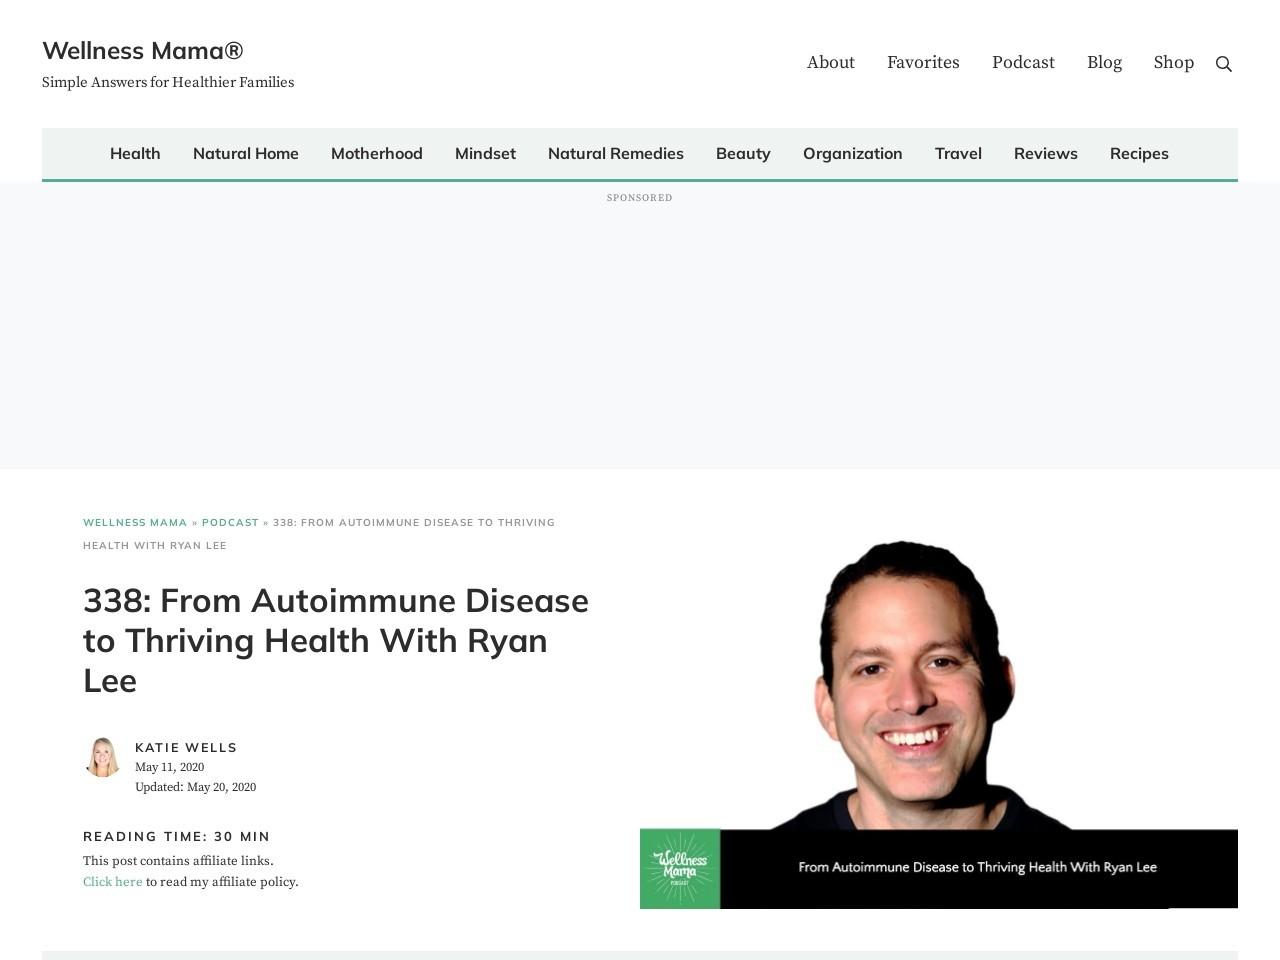 Autoimmune Disease to Thriving Health With Ryan Lee